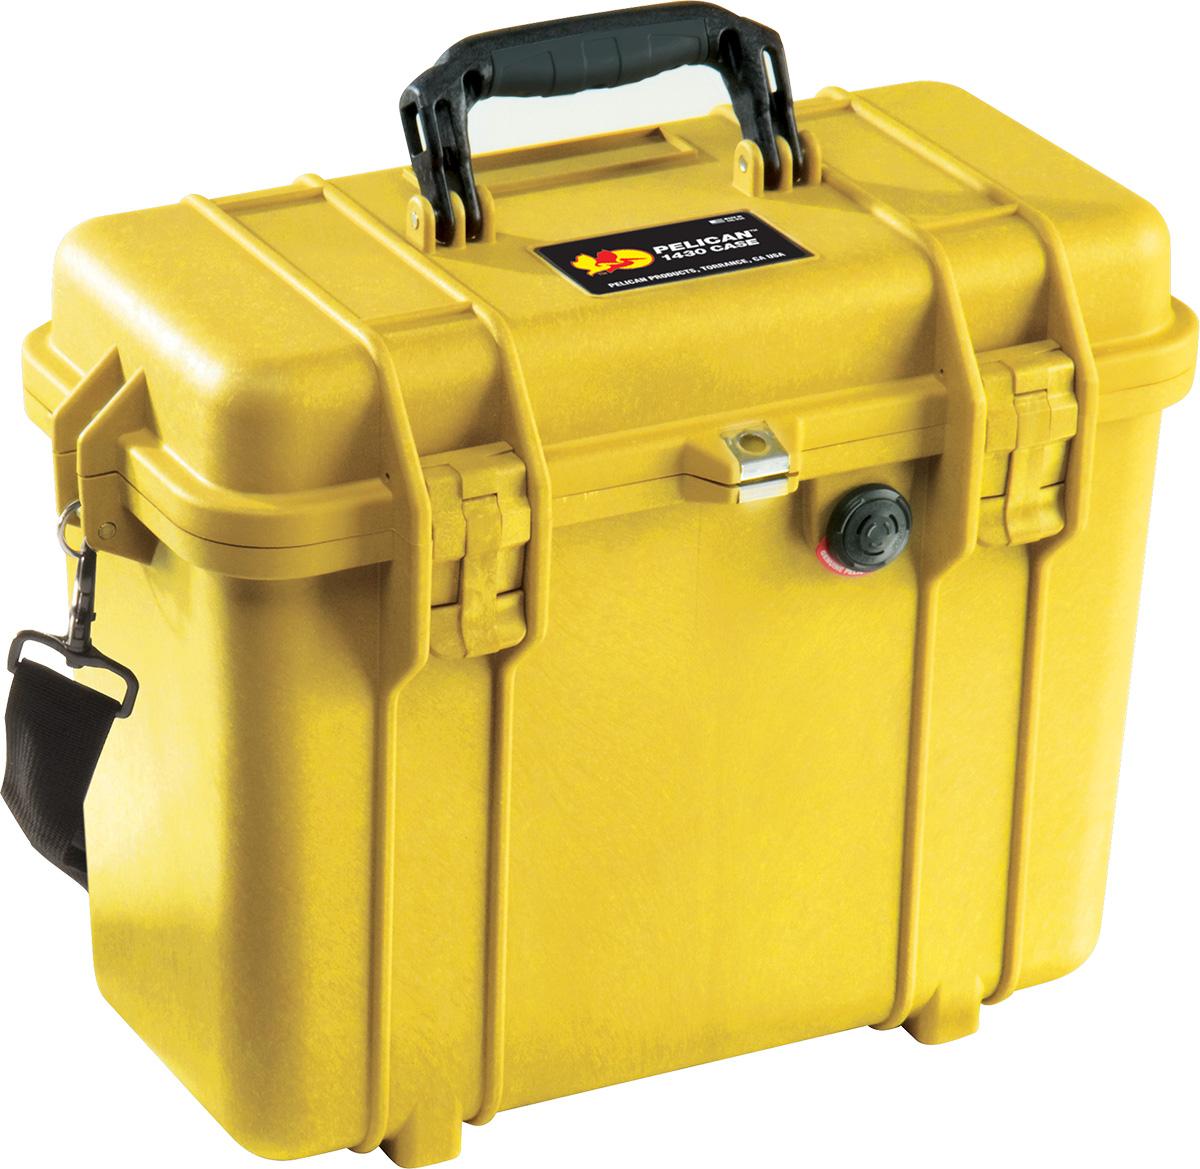 pelican 1430 top loader case yellow